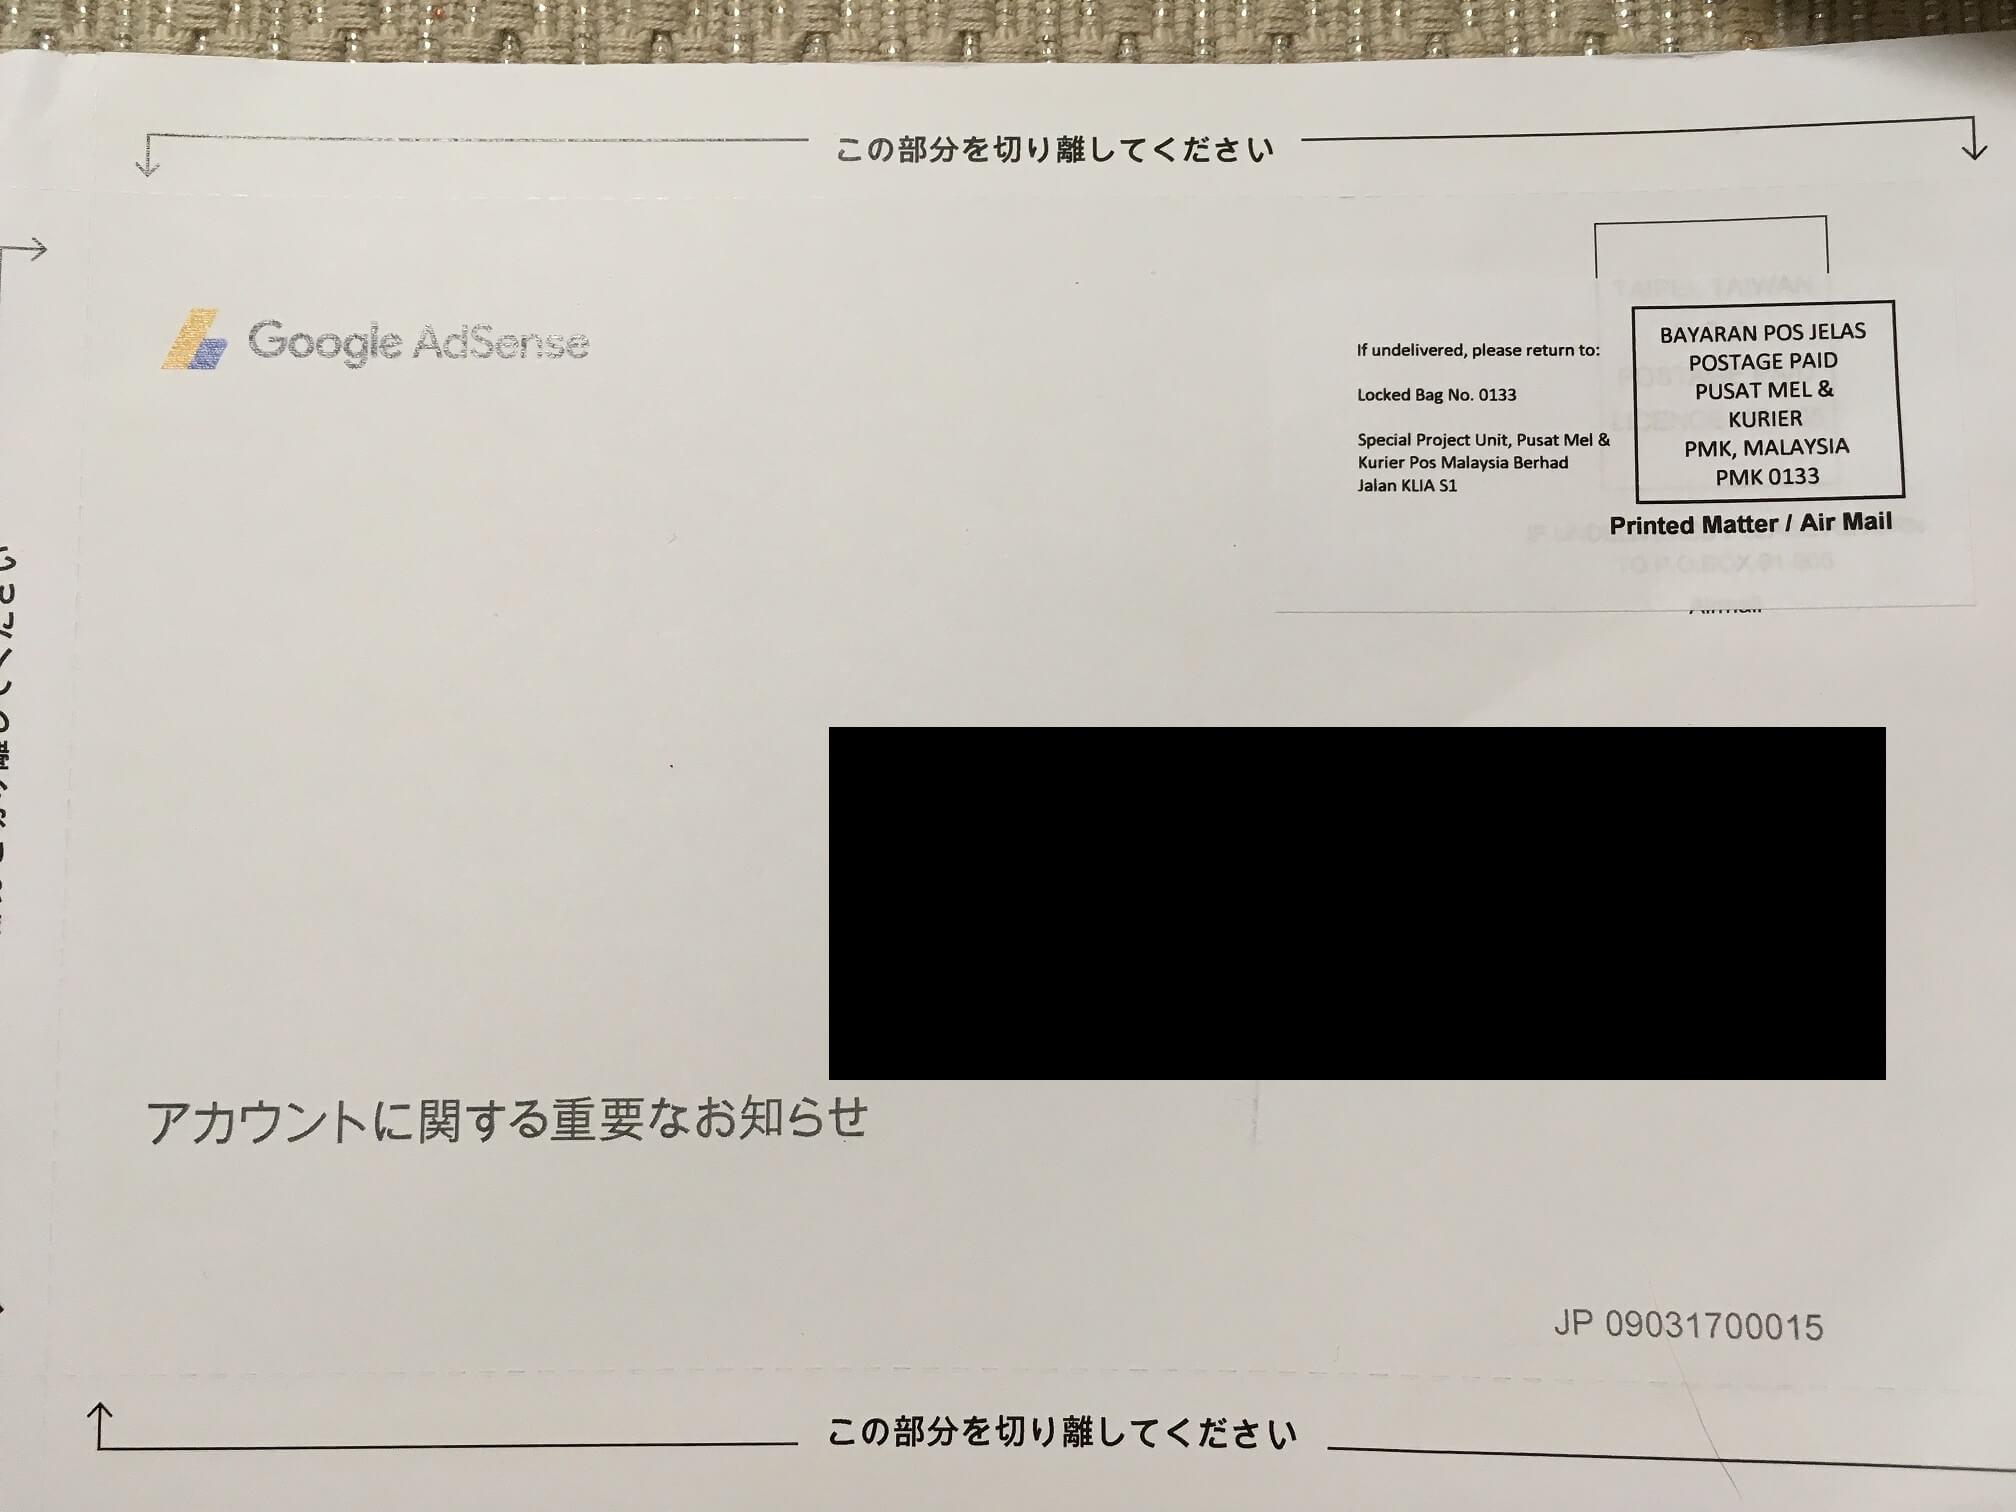 google adsense郵便物